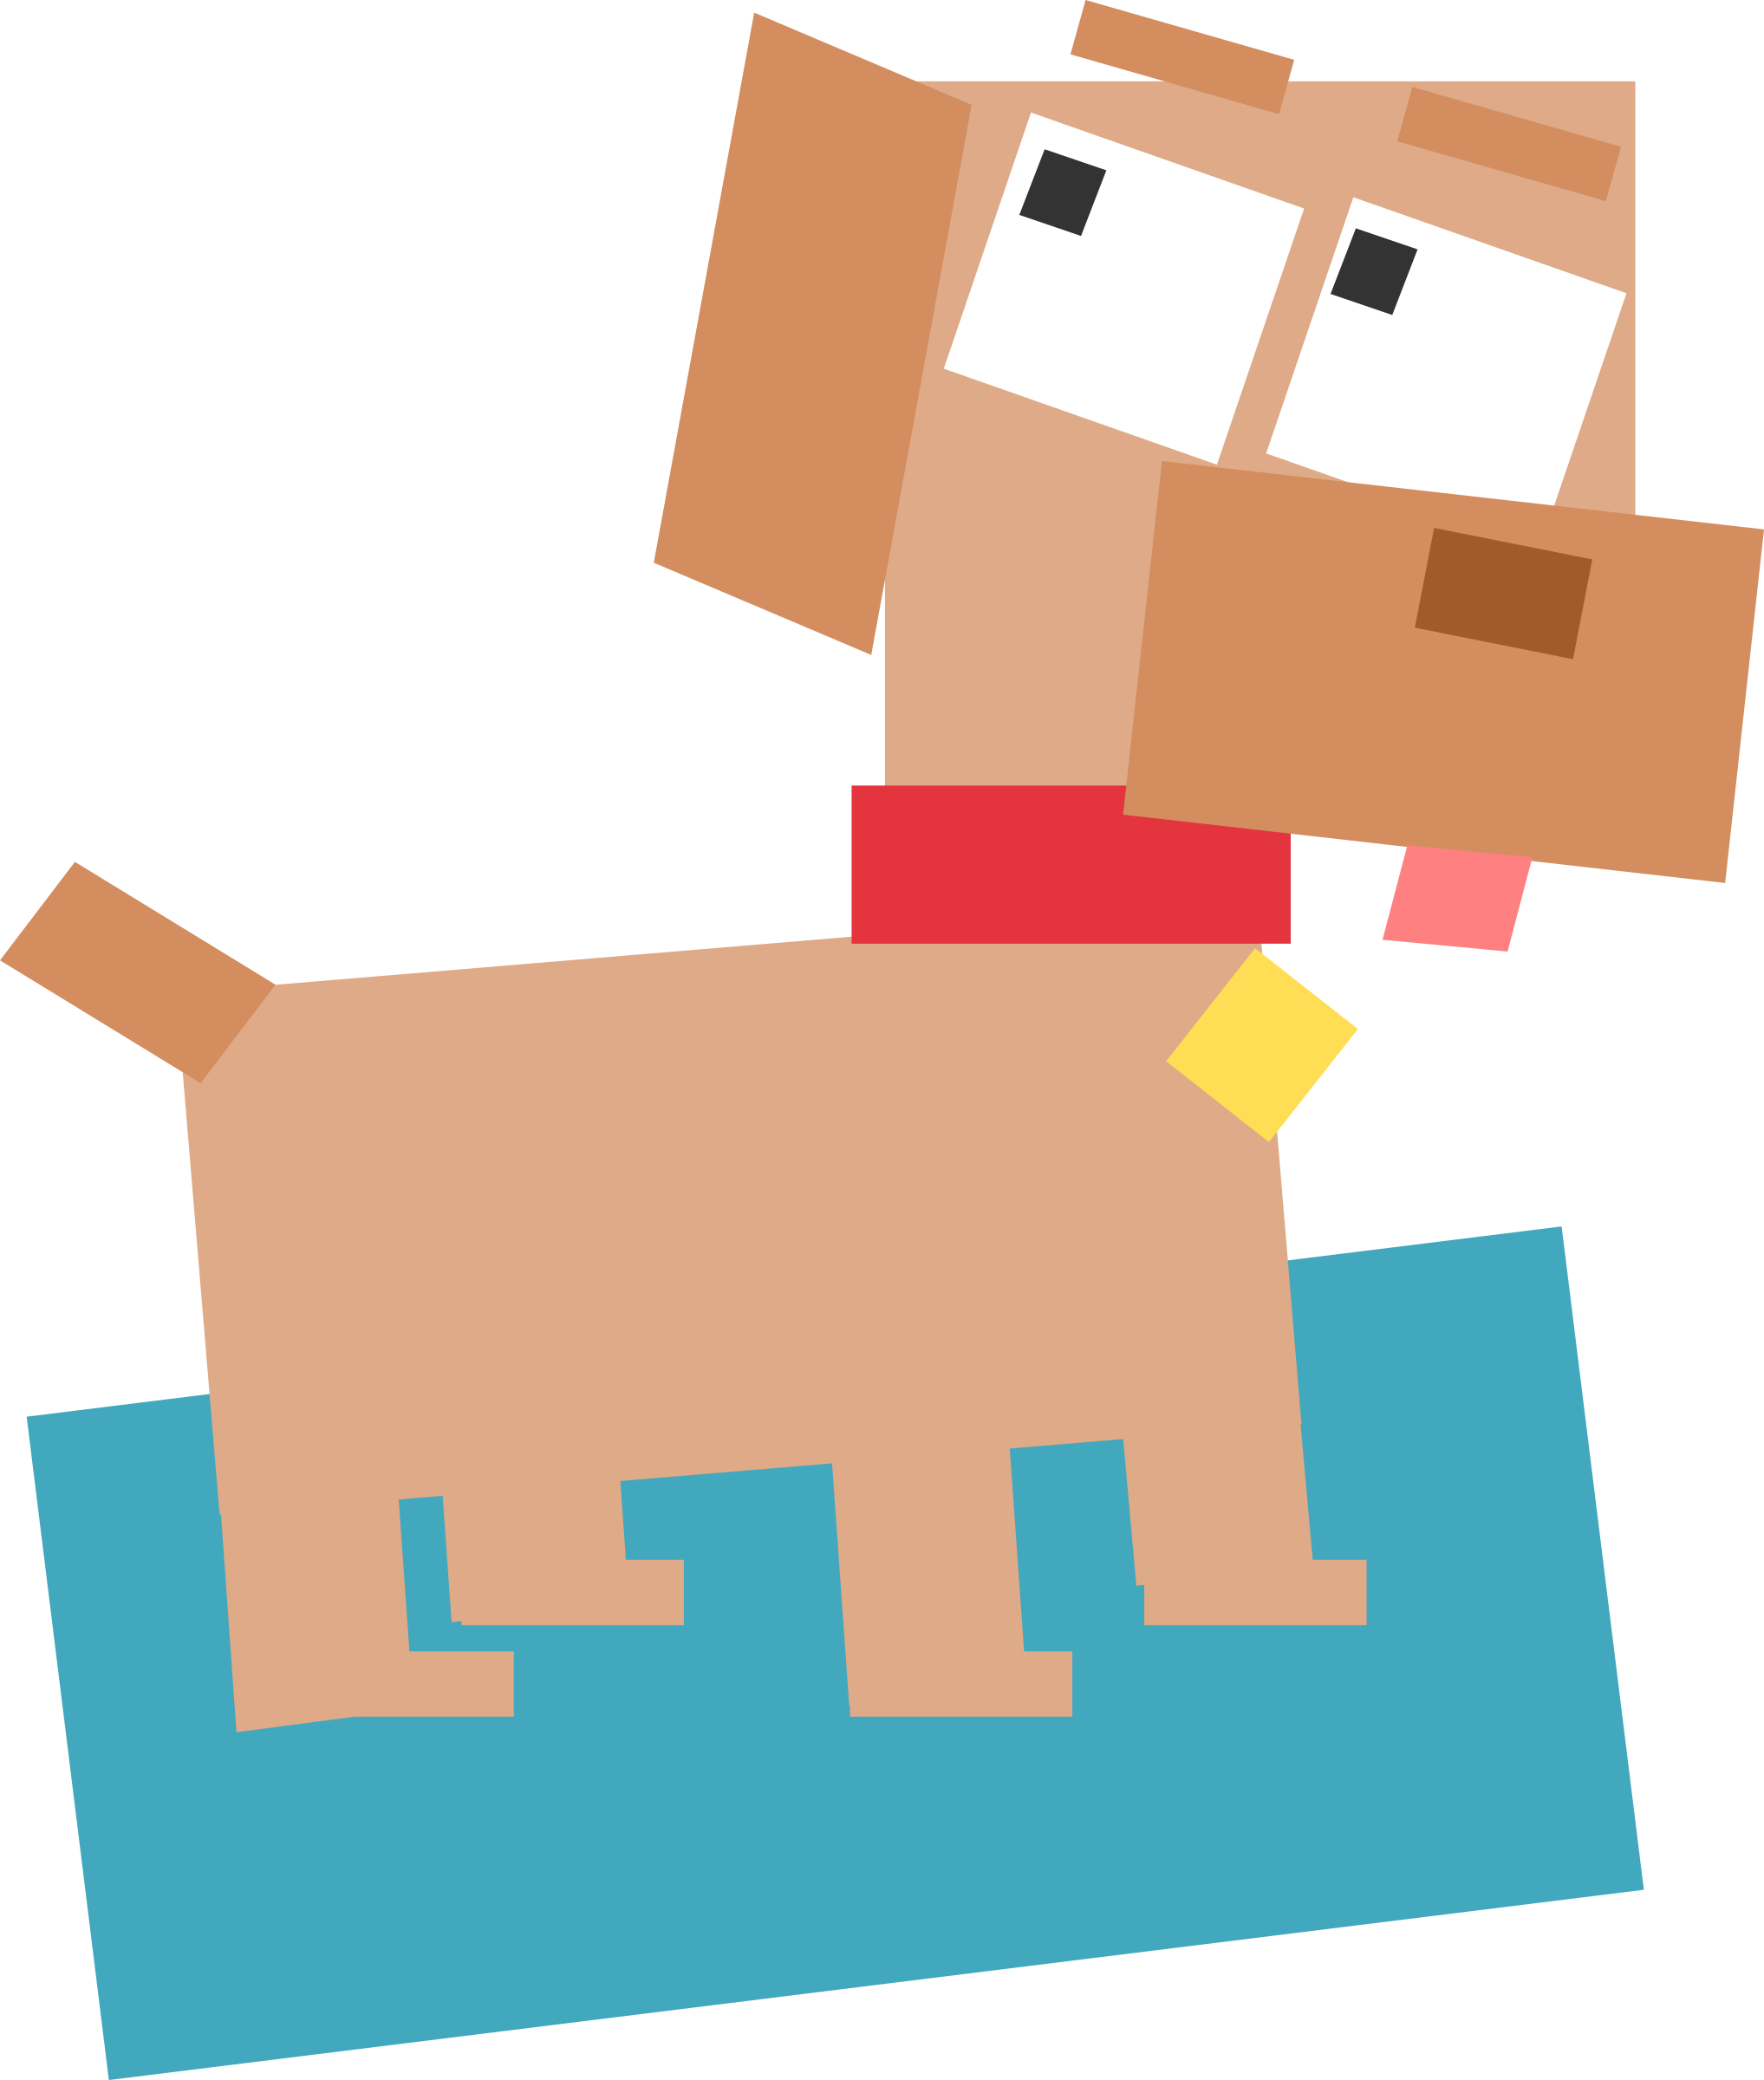 Animal dog big image. Square clipart cartoon